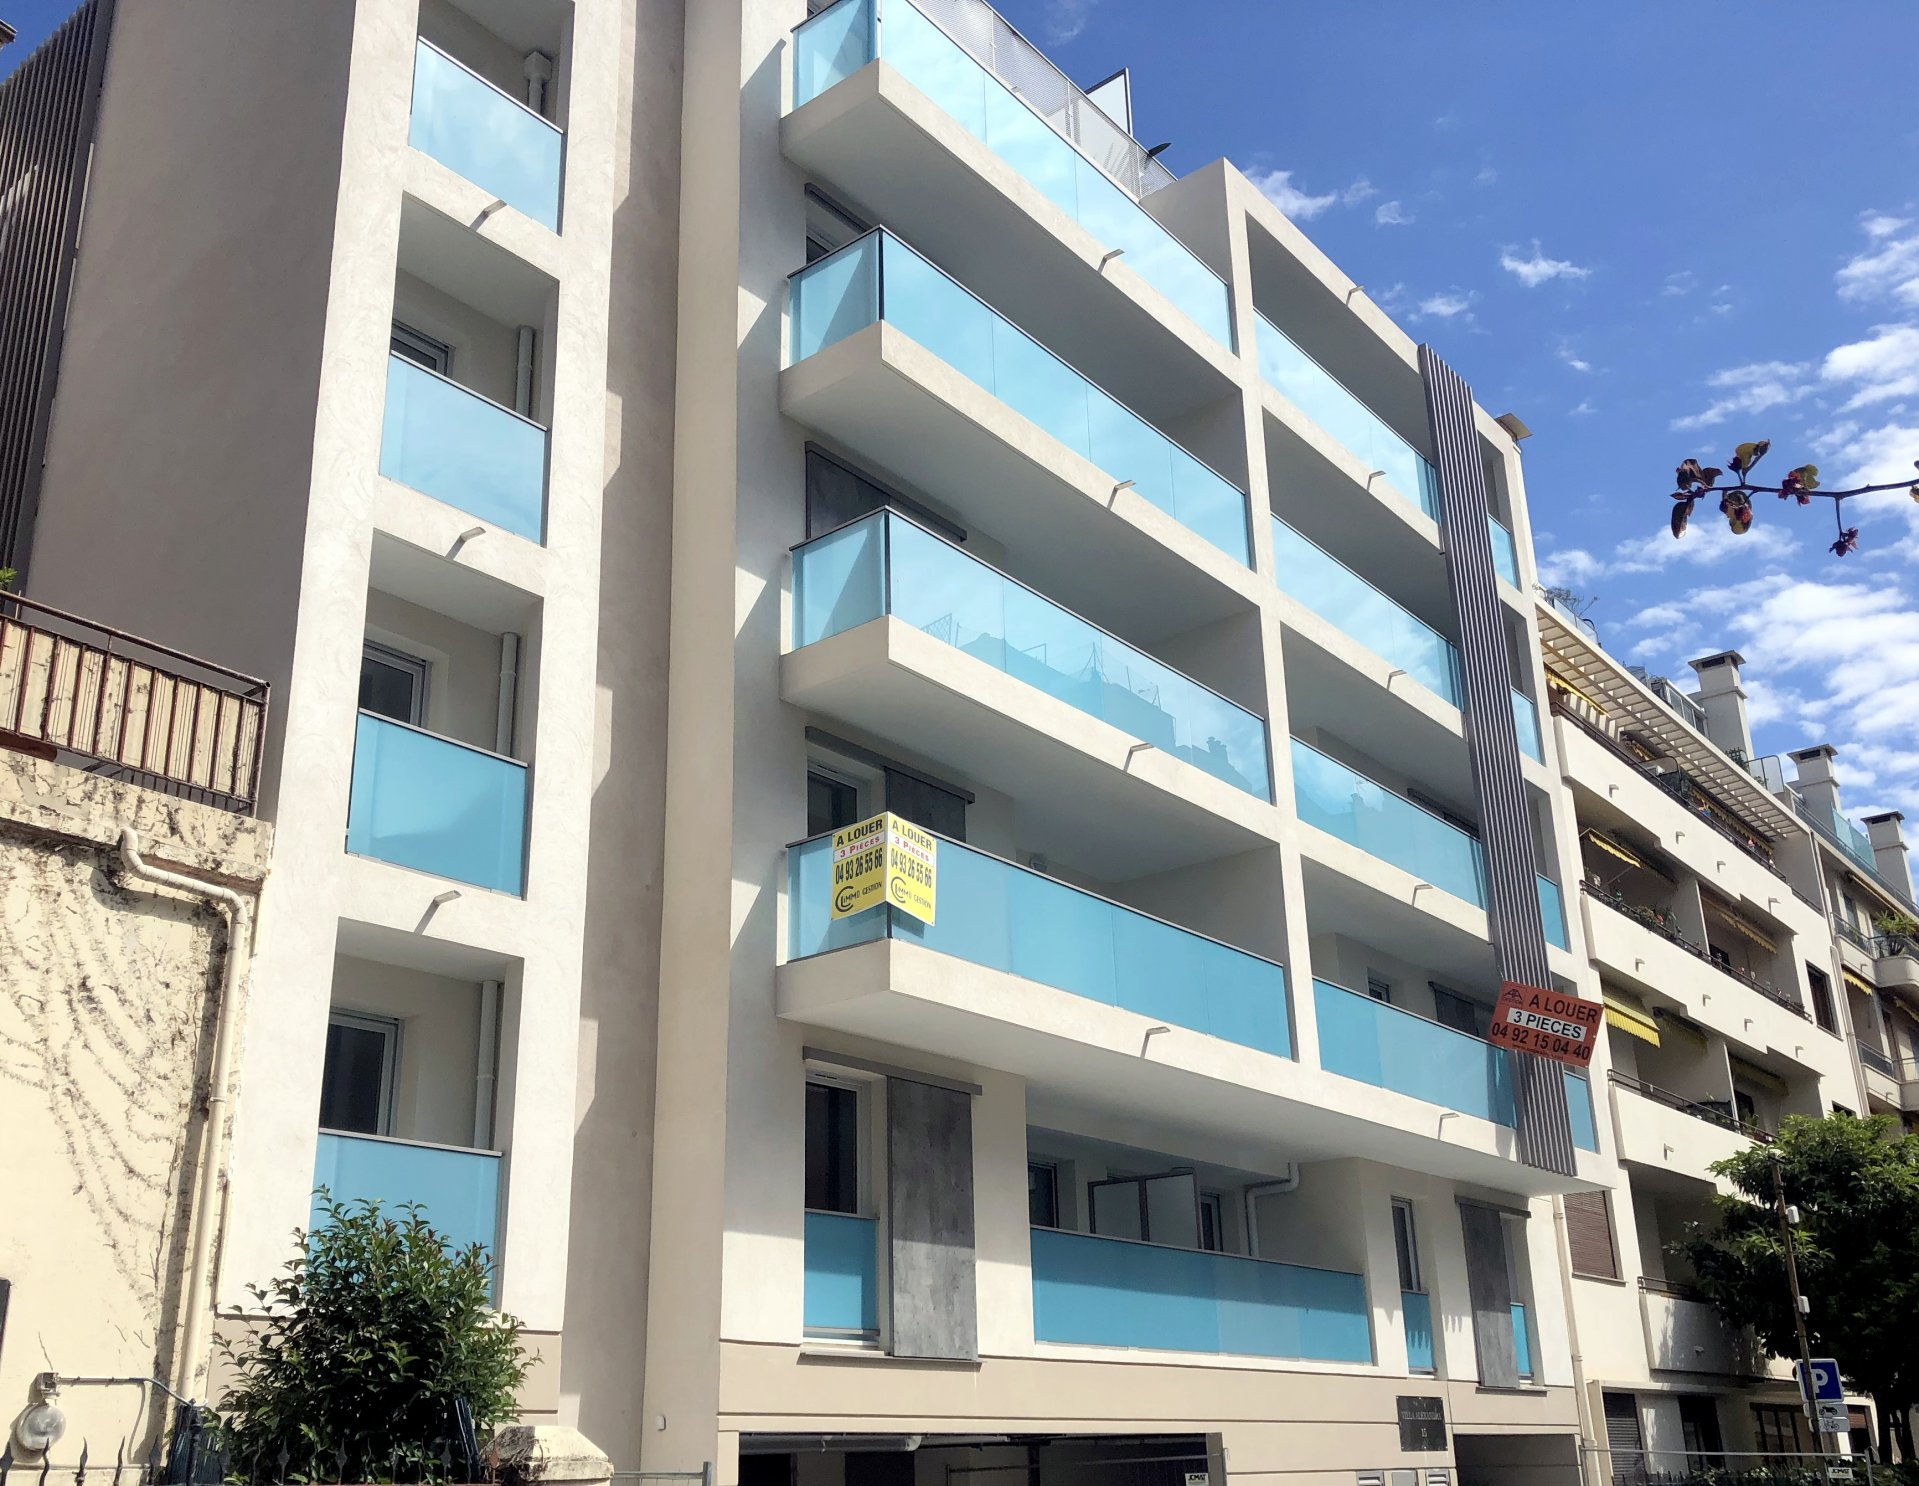 Location Nice, 3 pièces 66.7m² secteur Gambetta